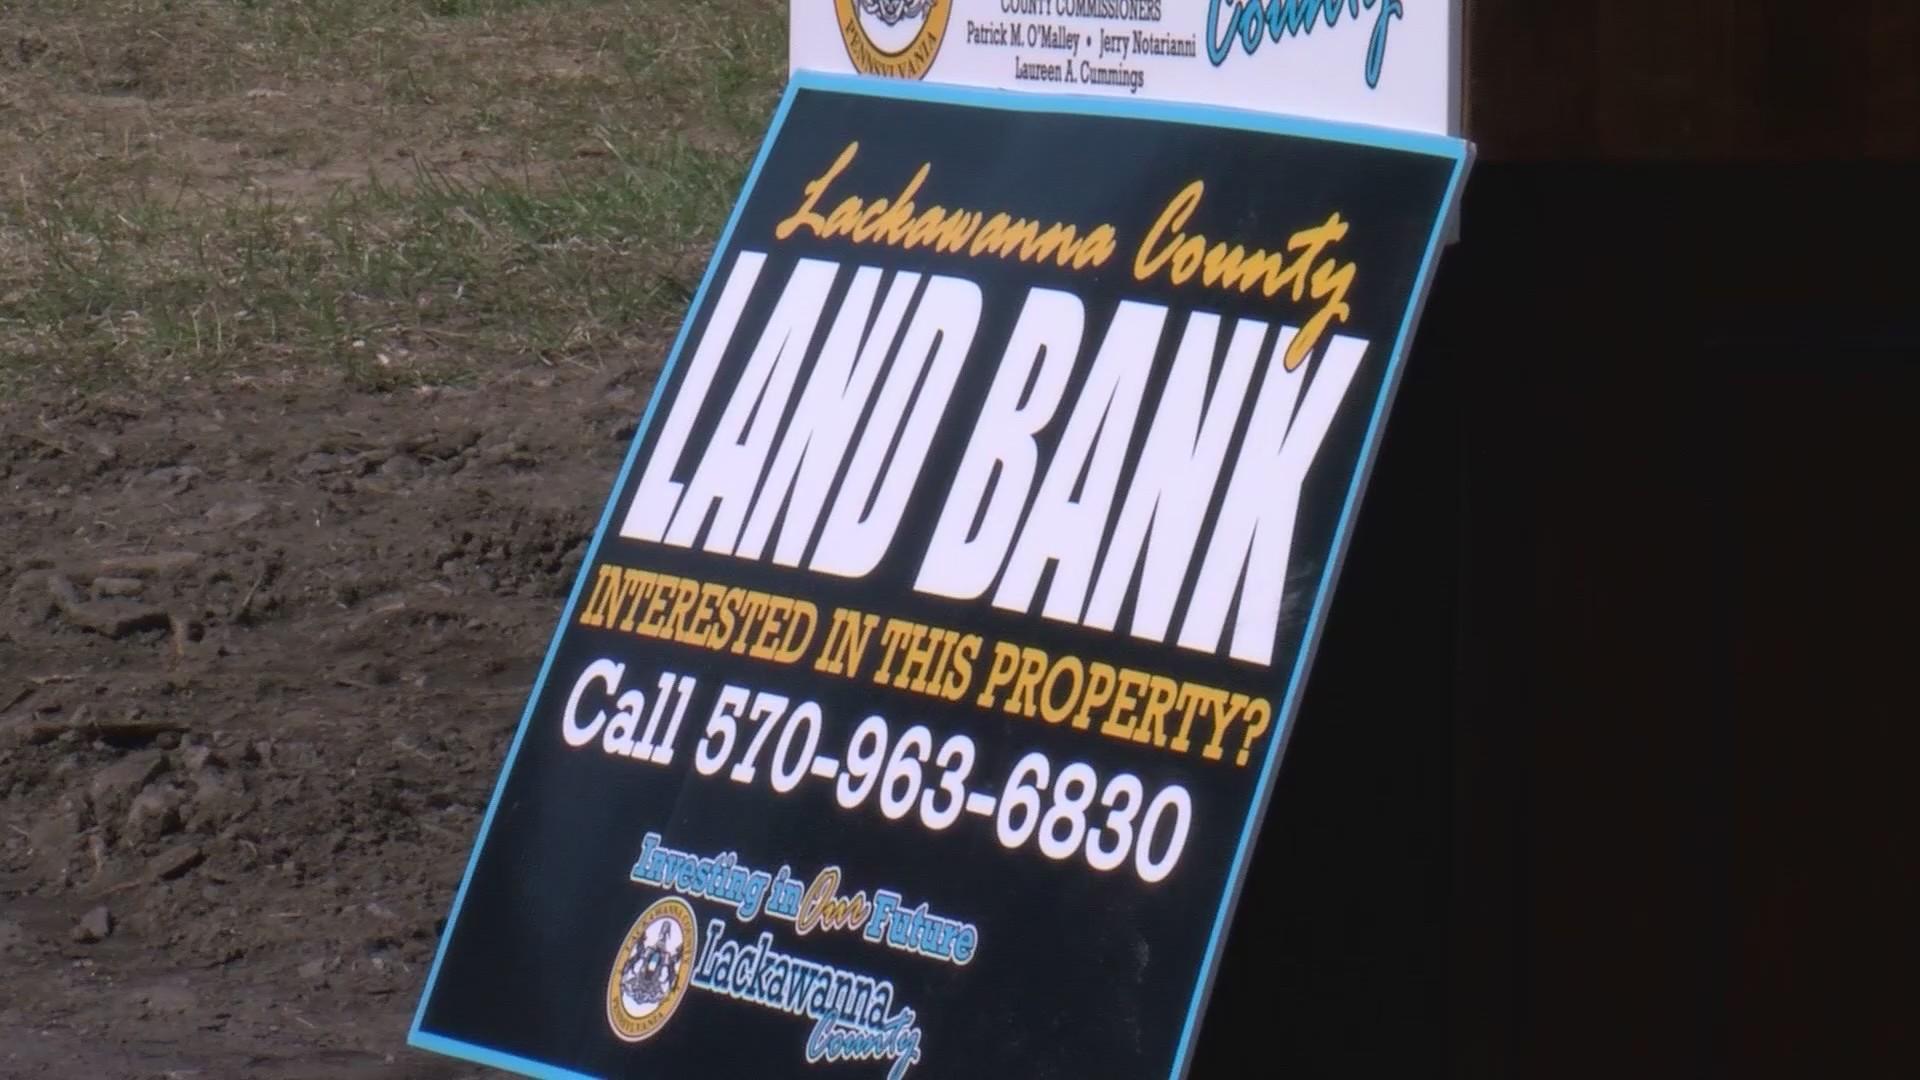 Lackawanna_County_Land_Bank_celebrating__0_20190328212837